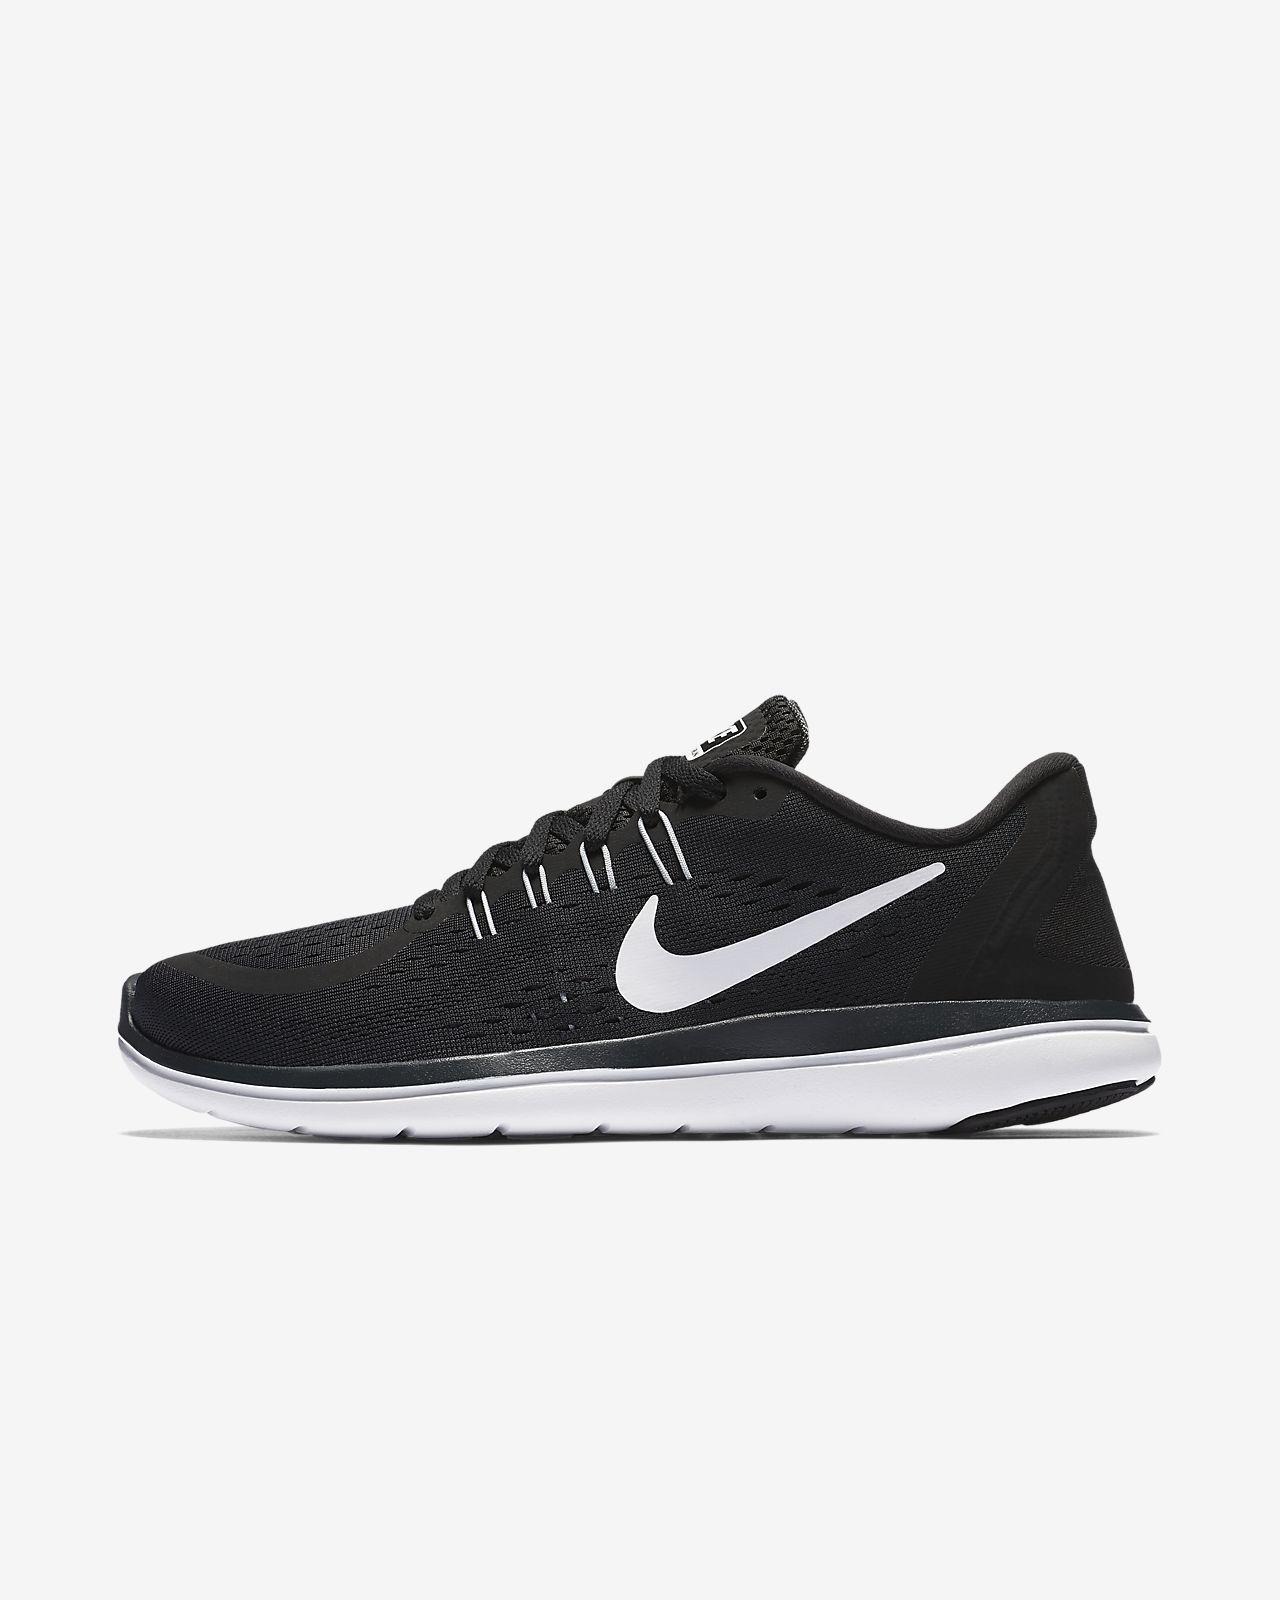 Nike W Flex Experience RN 7, Chaussures de Running Femme, Noir (Black/White/White 001), 35.5 EU